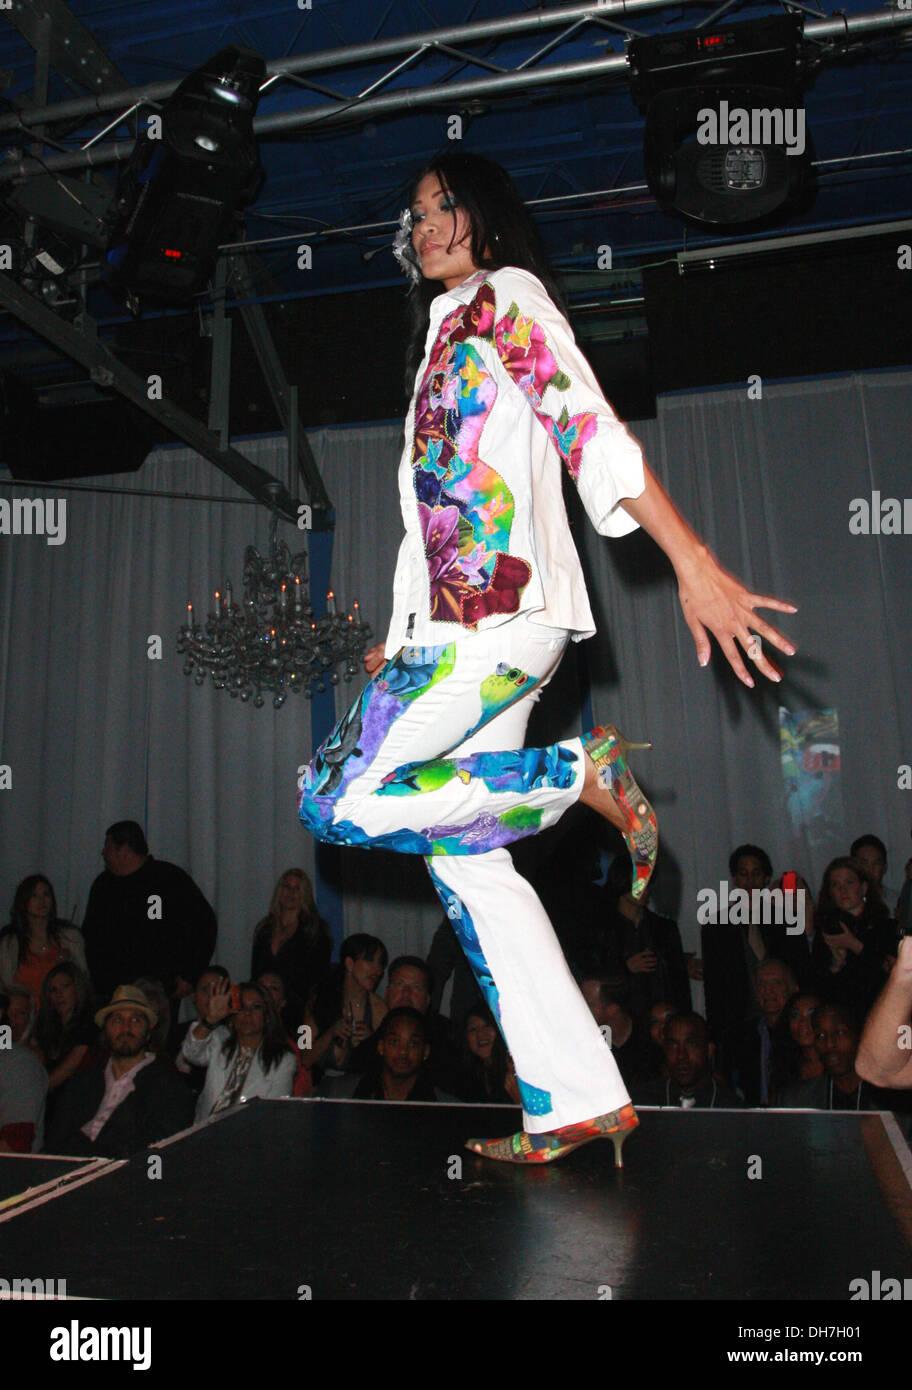 Fashion Show Runway Hollywood Top Designer Awards For La Fashion Stock Photo Alamy